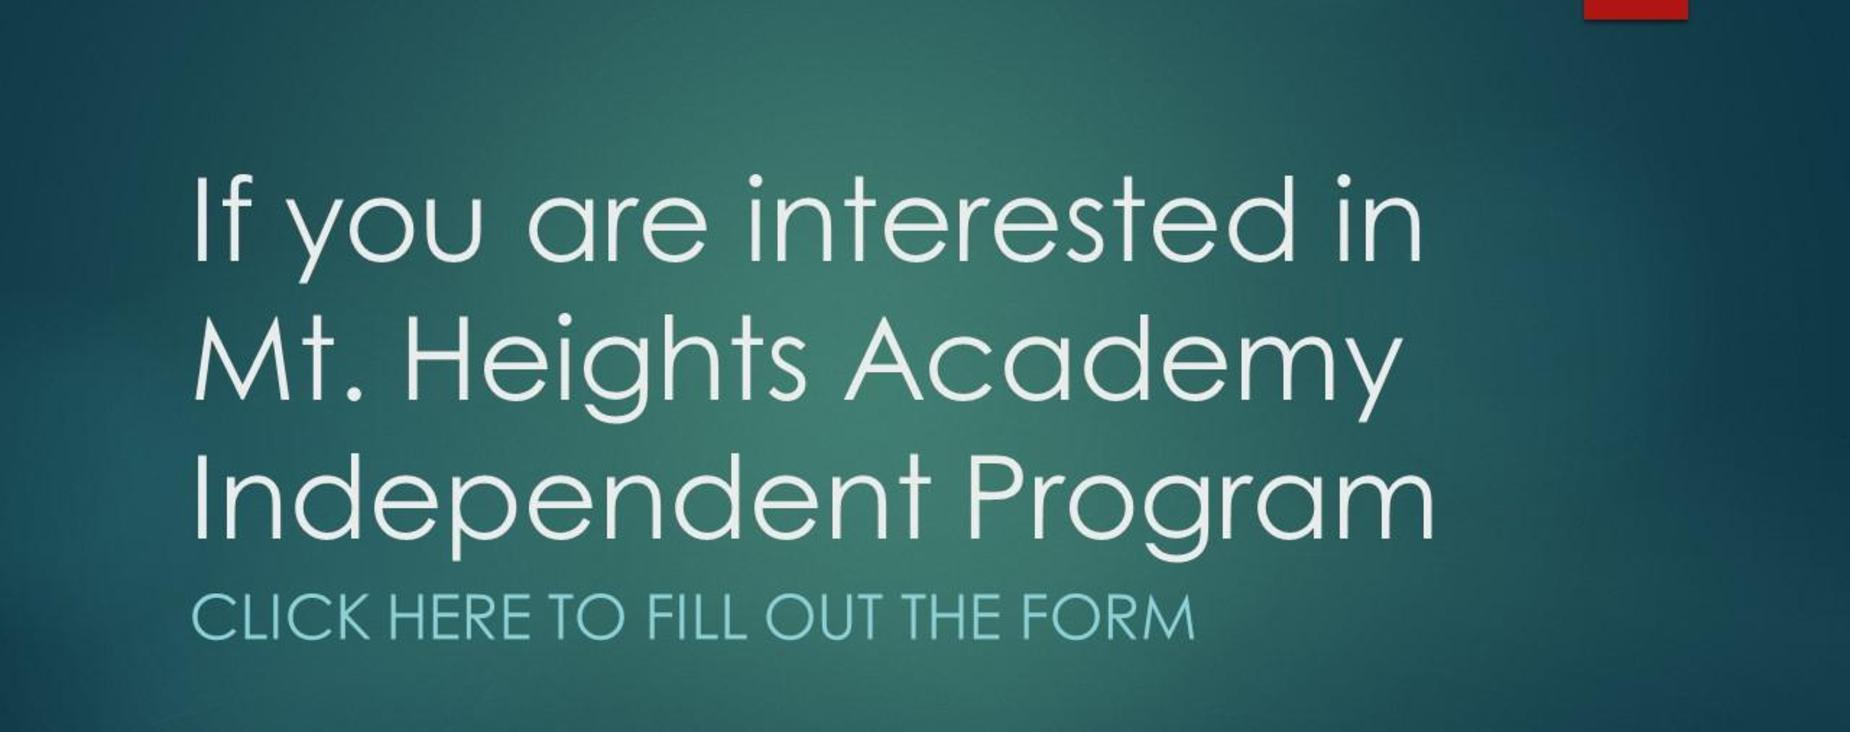 Mt. Heights Academy Interest Form